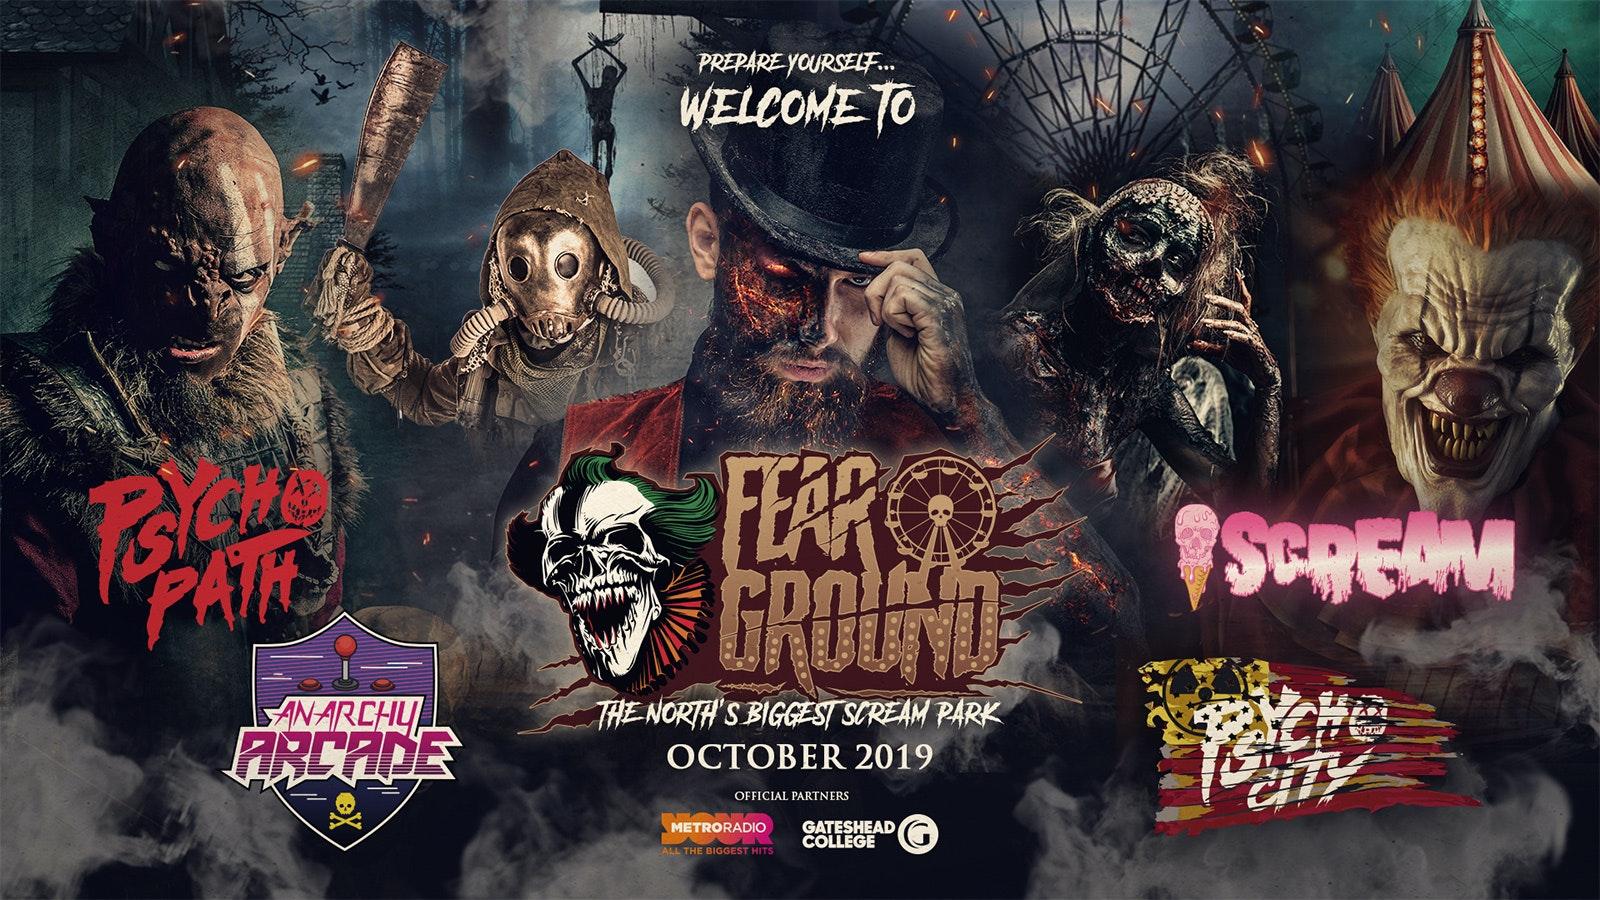 Psycho Path – Friday 11th October 2019